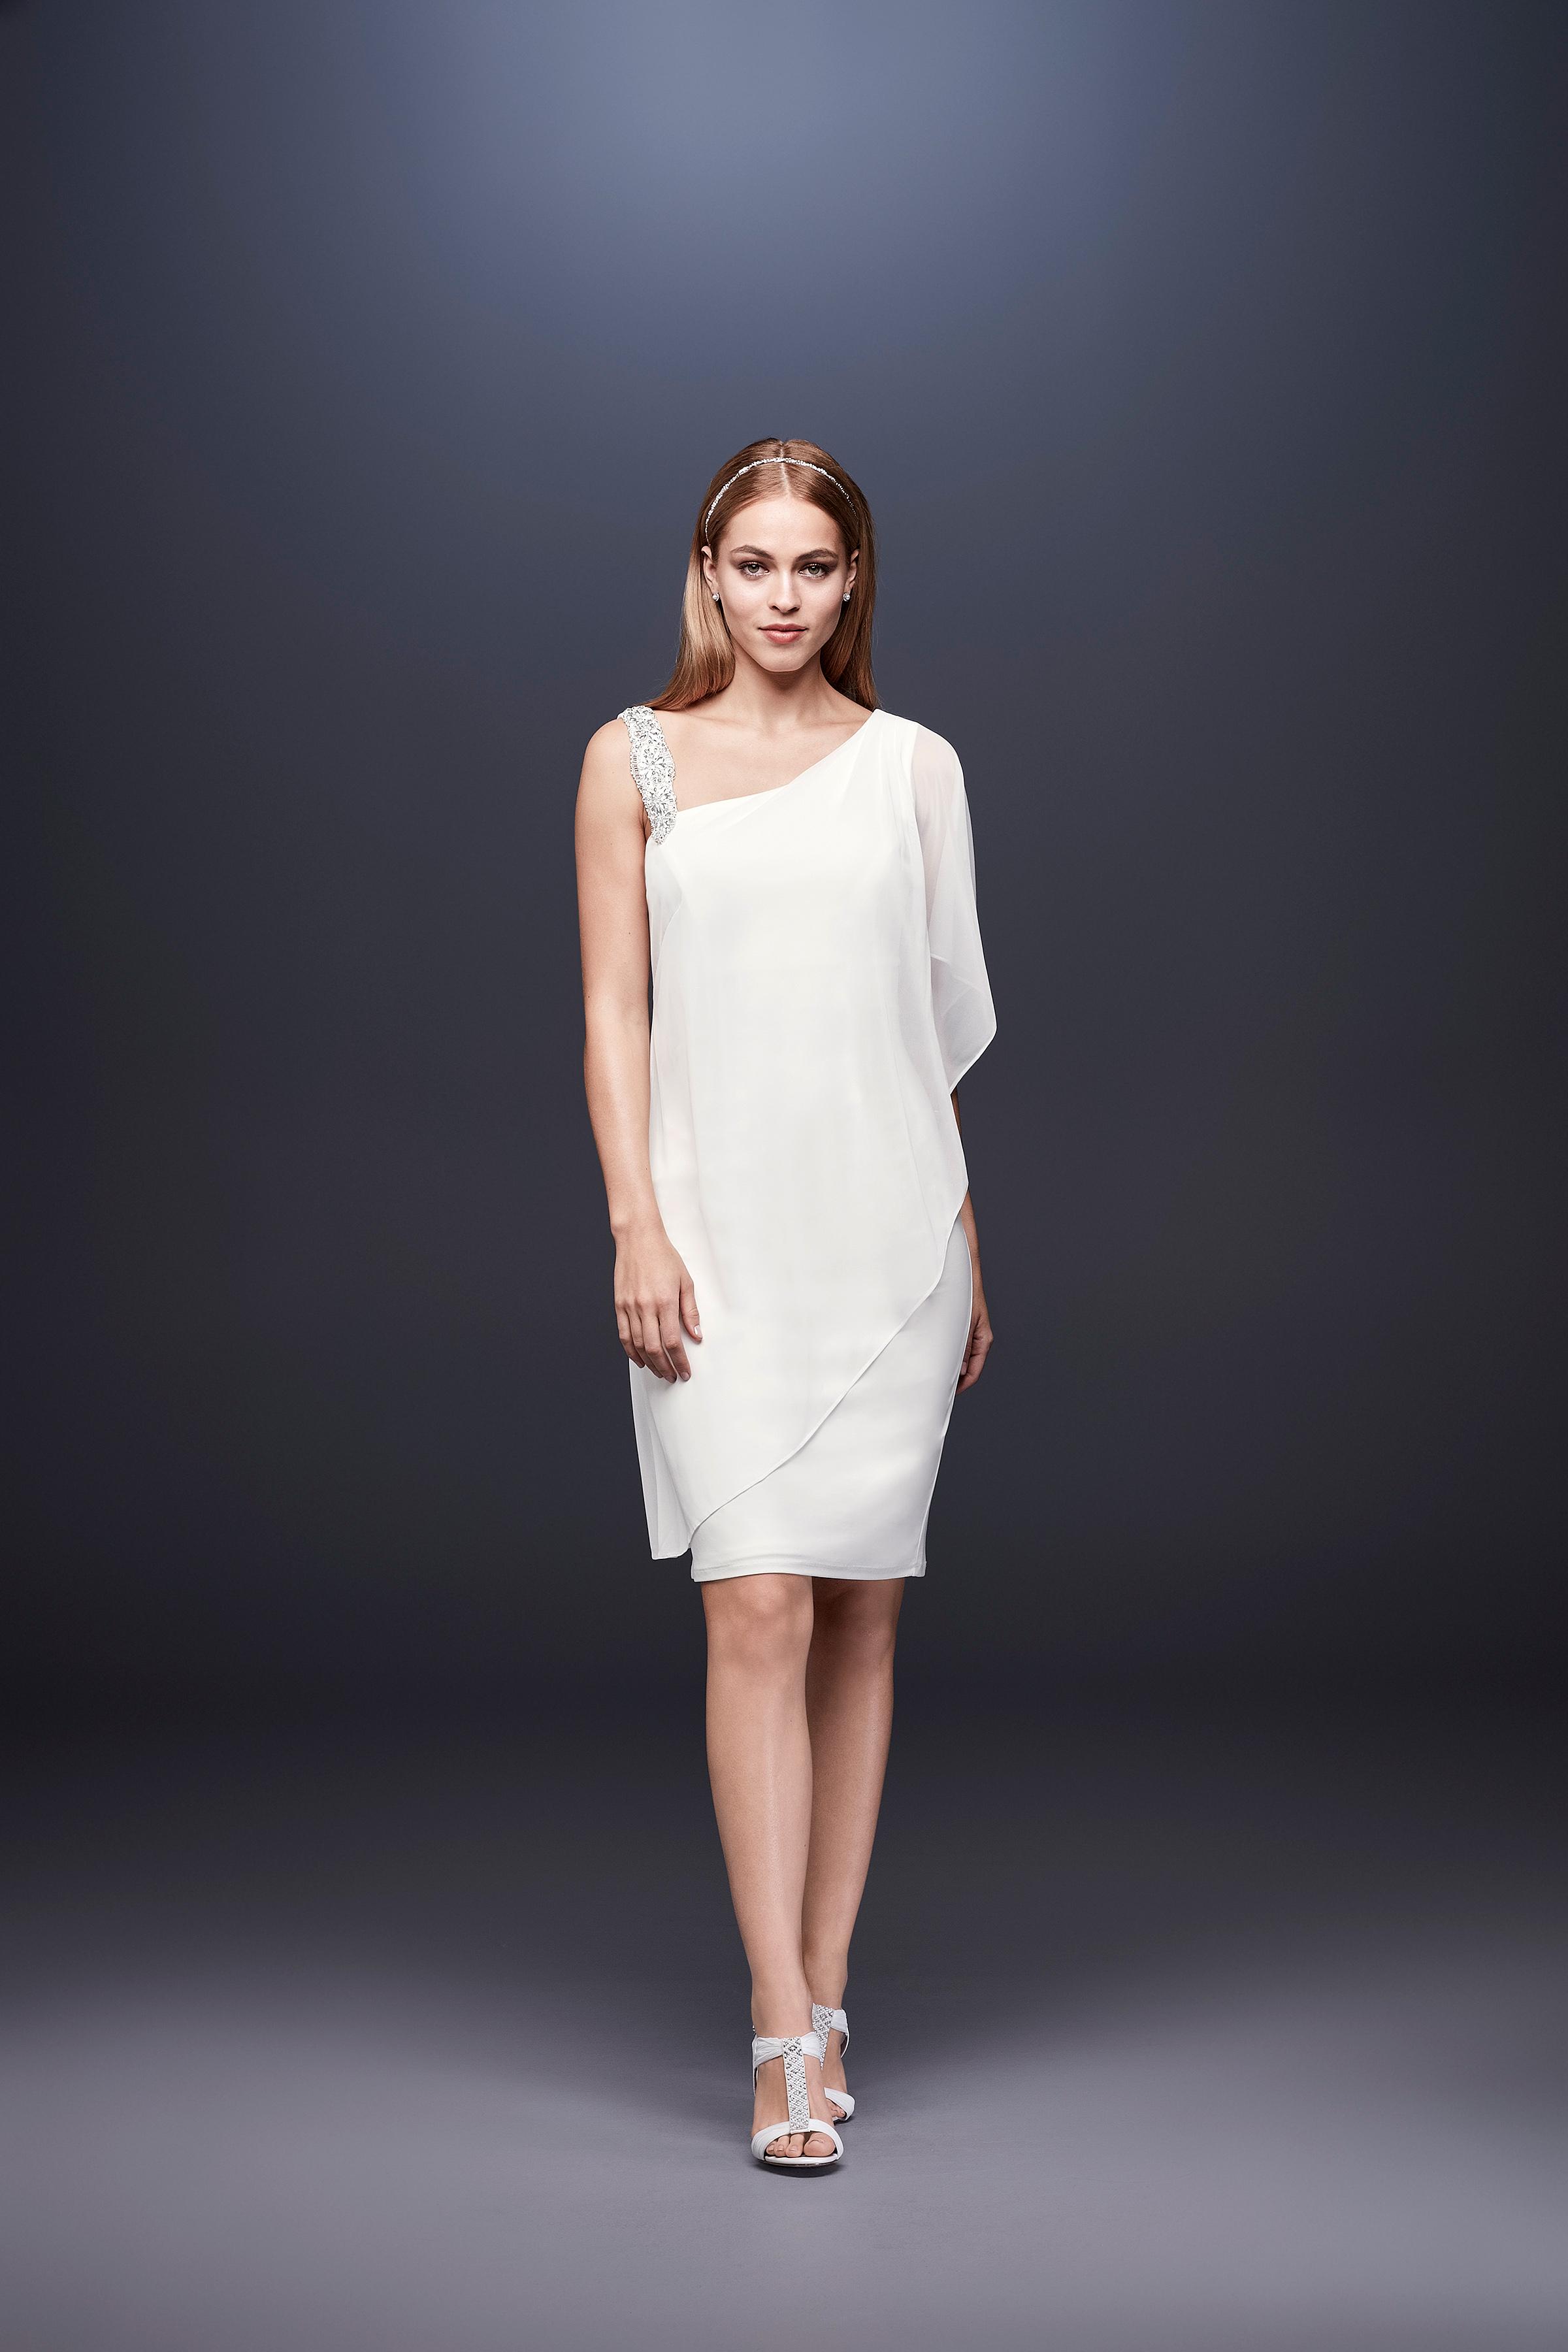 david bridal wedding dress spring 2019 sheath short one shoulder